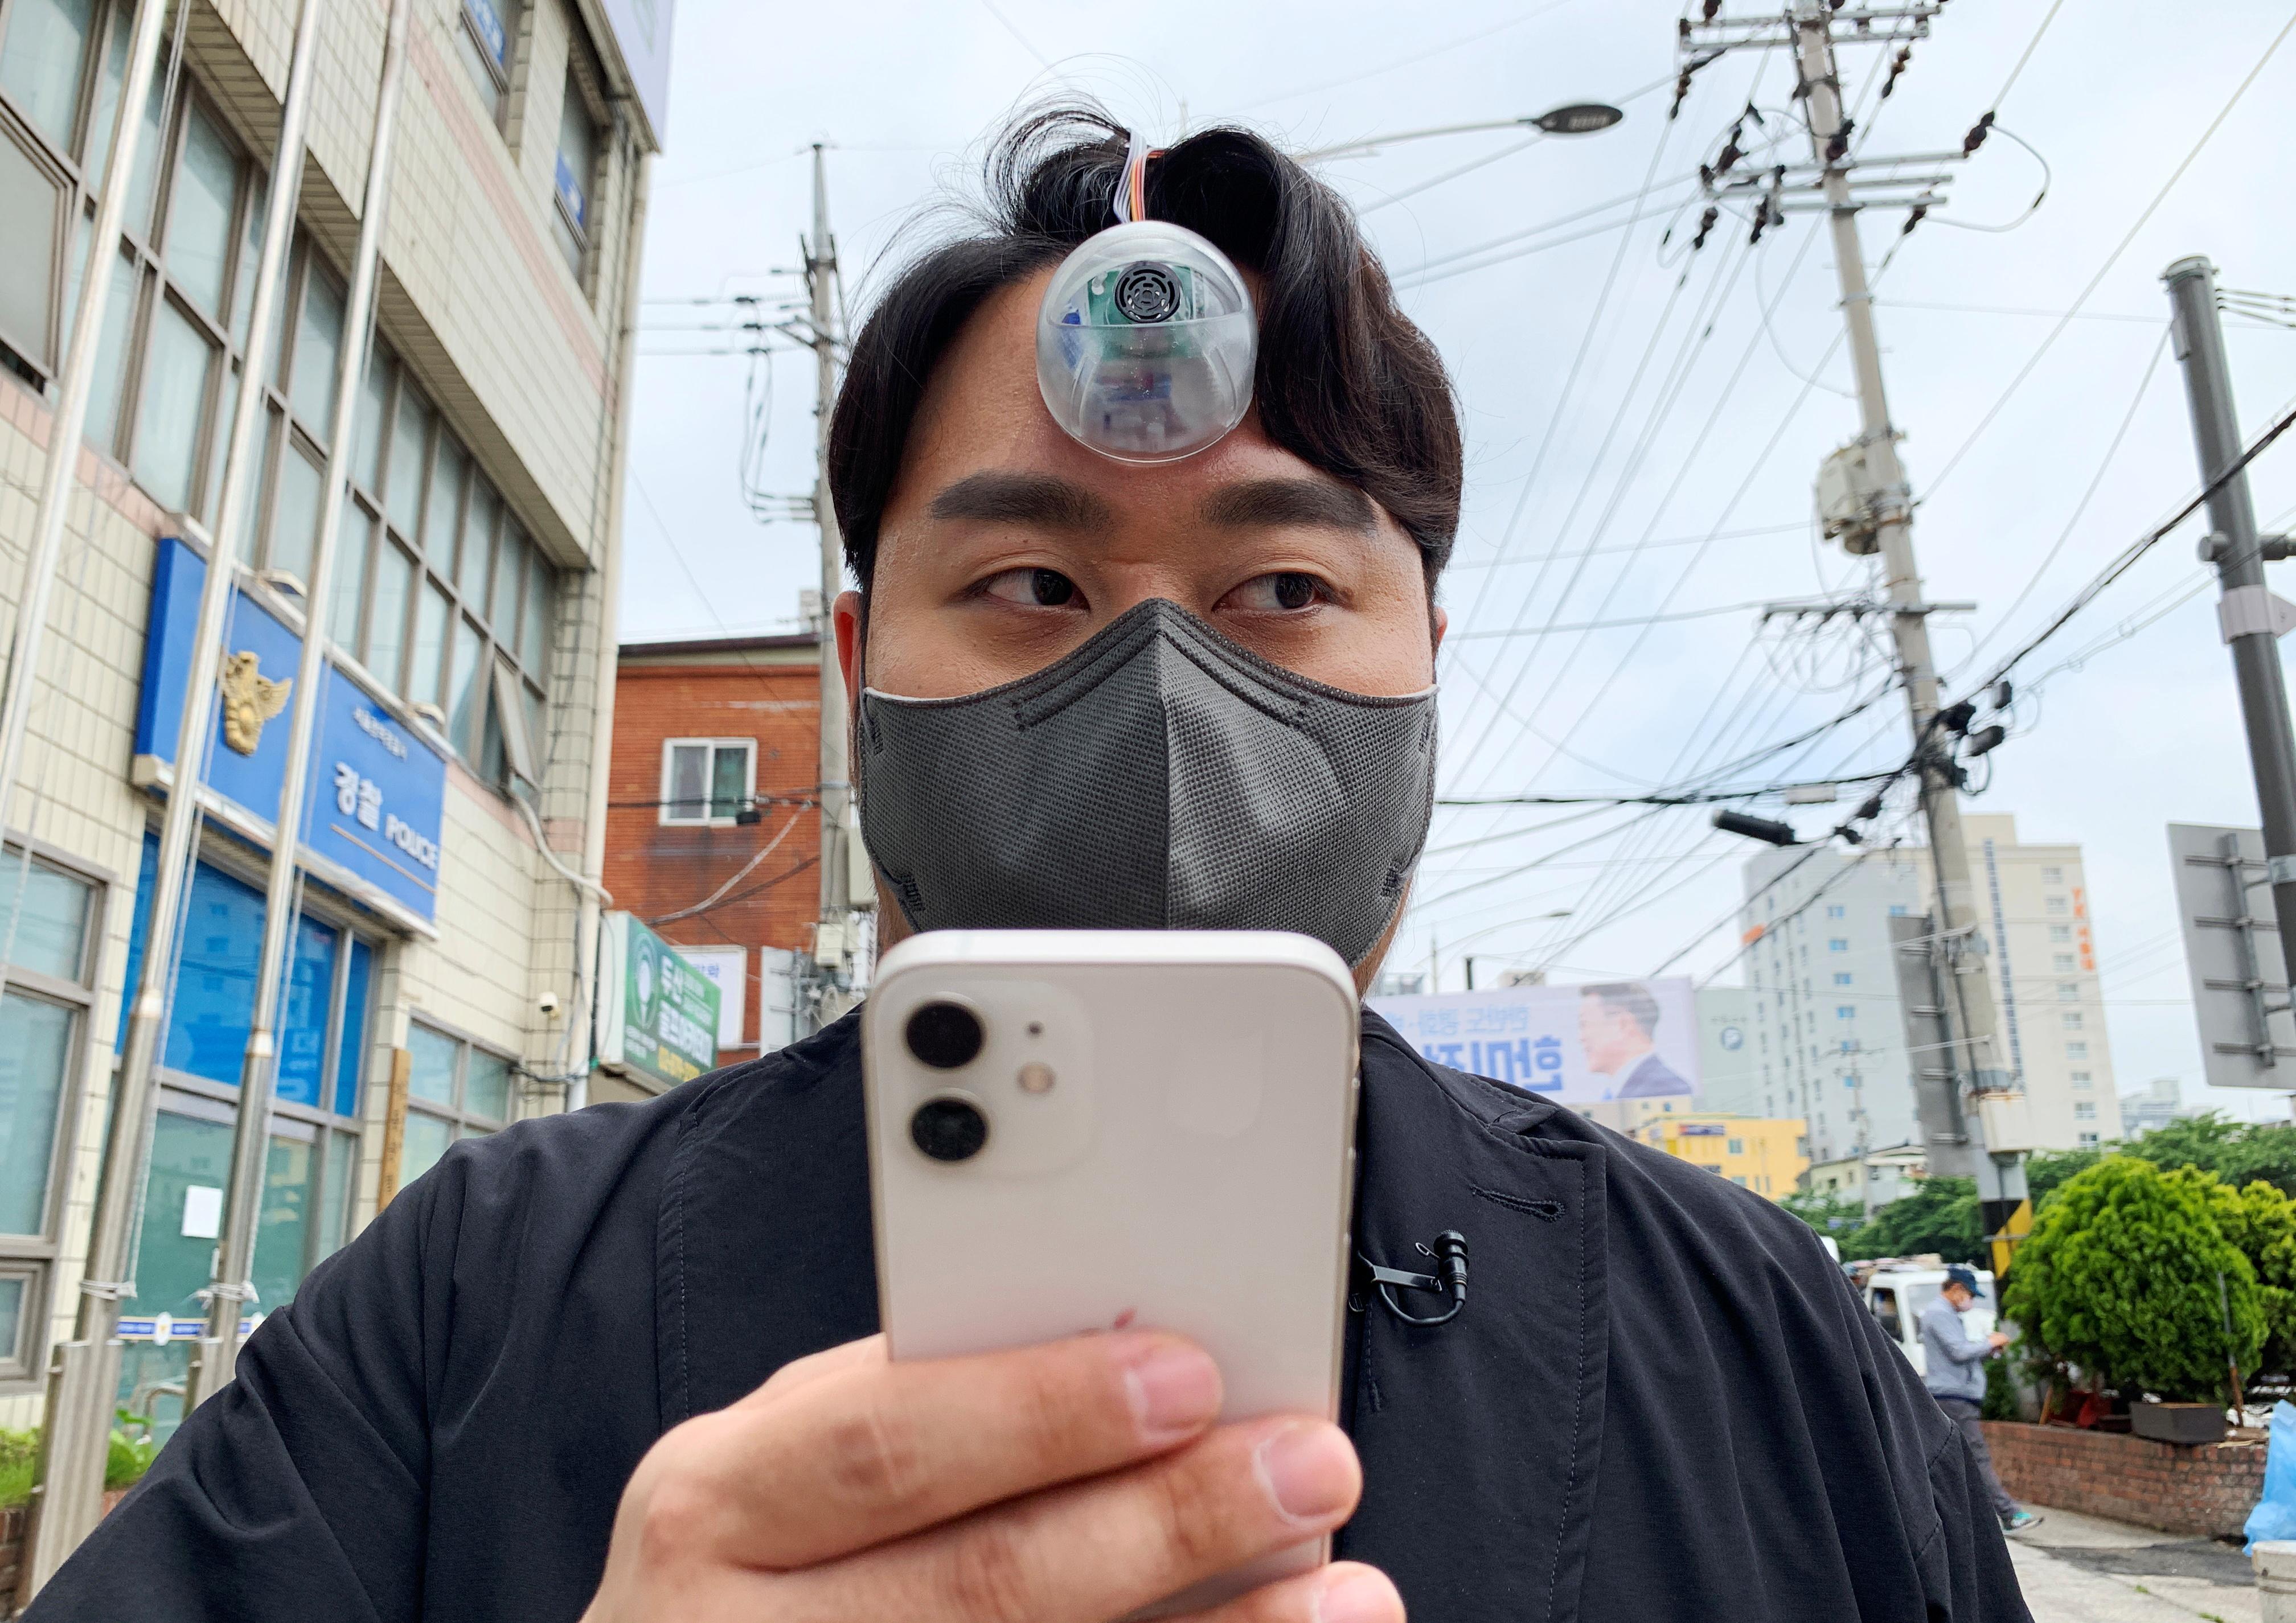 South Korean industrial designer Paeng Min-wook shows a robot eye, called